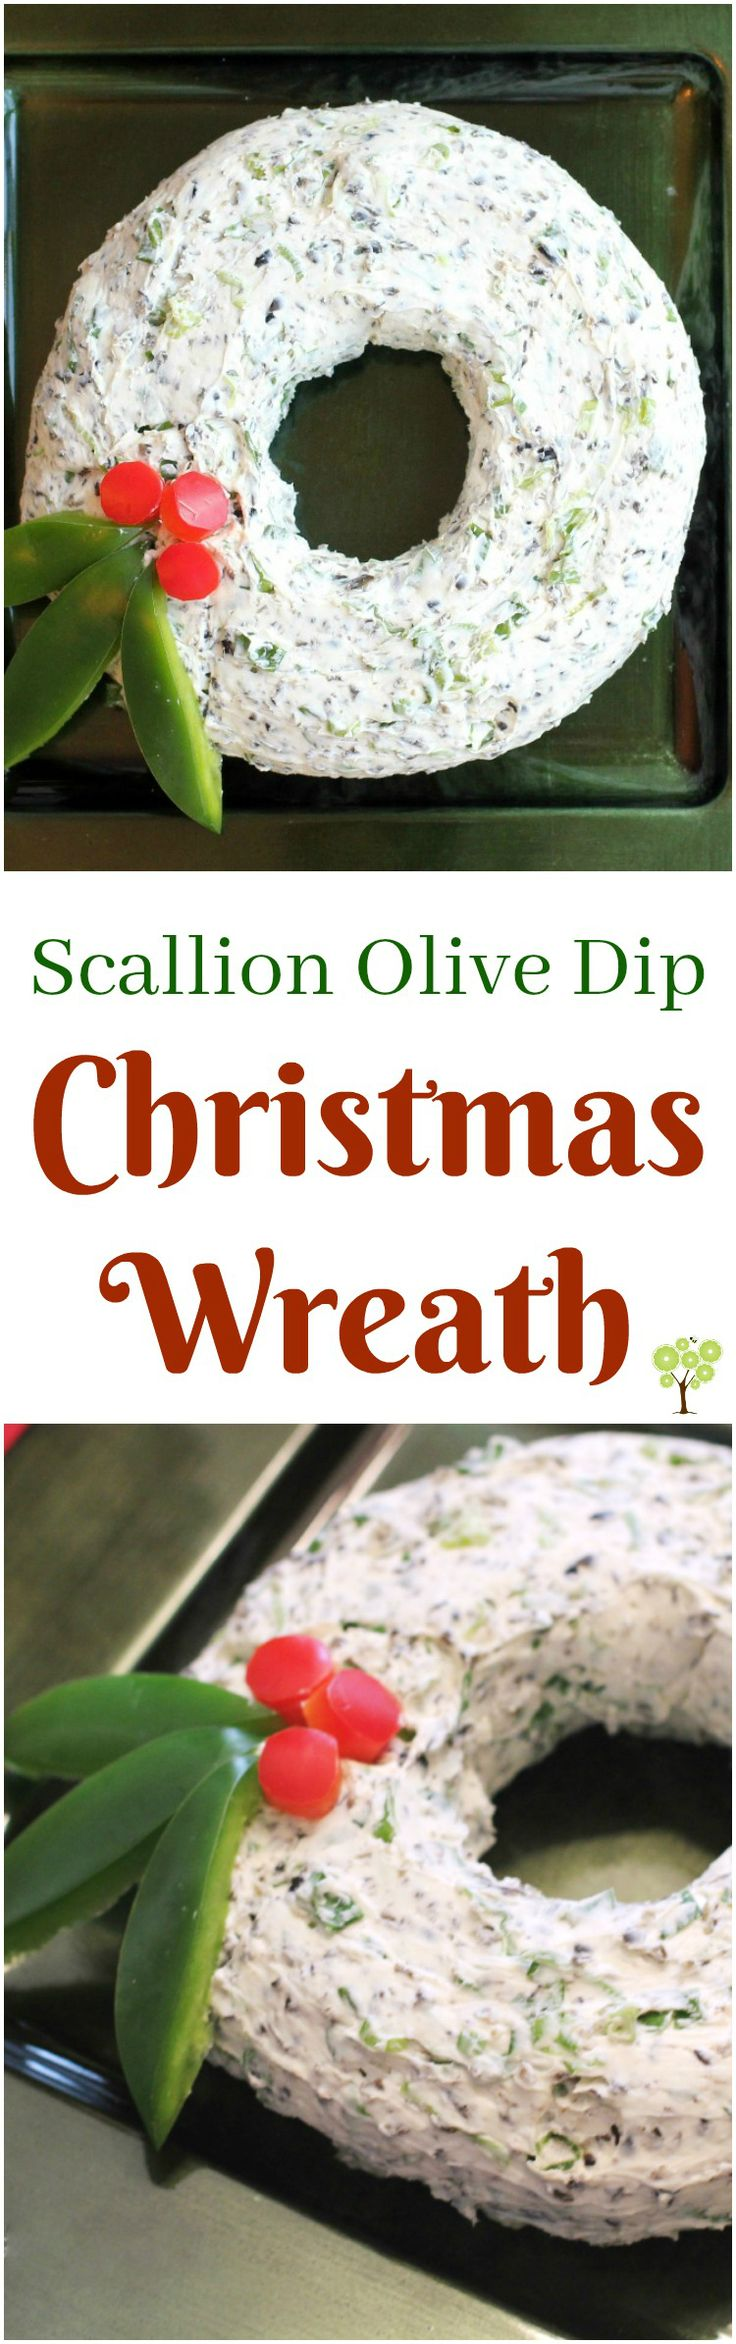 Scallion Olive Dip http://wp.me/p4qC4h-58